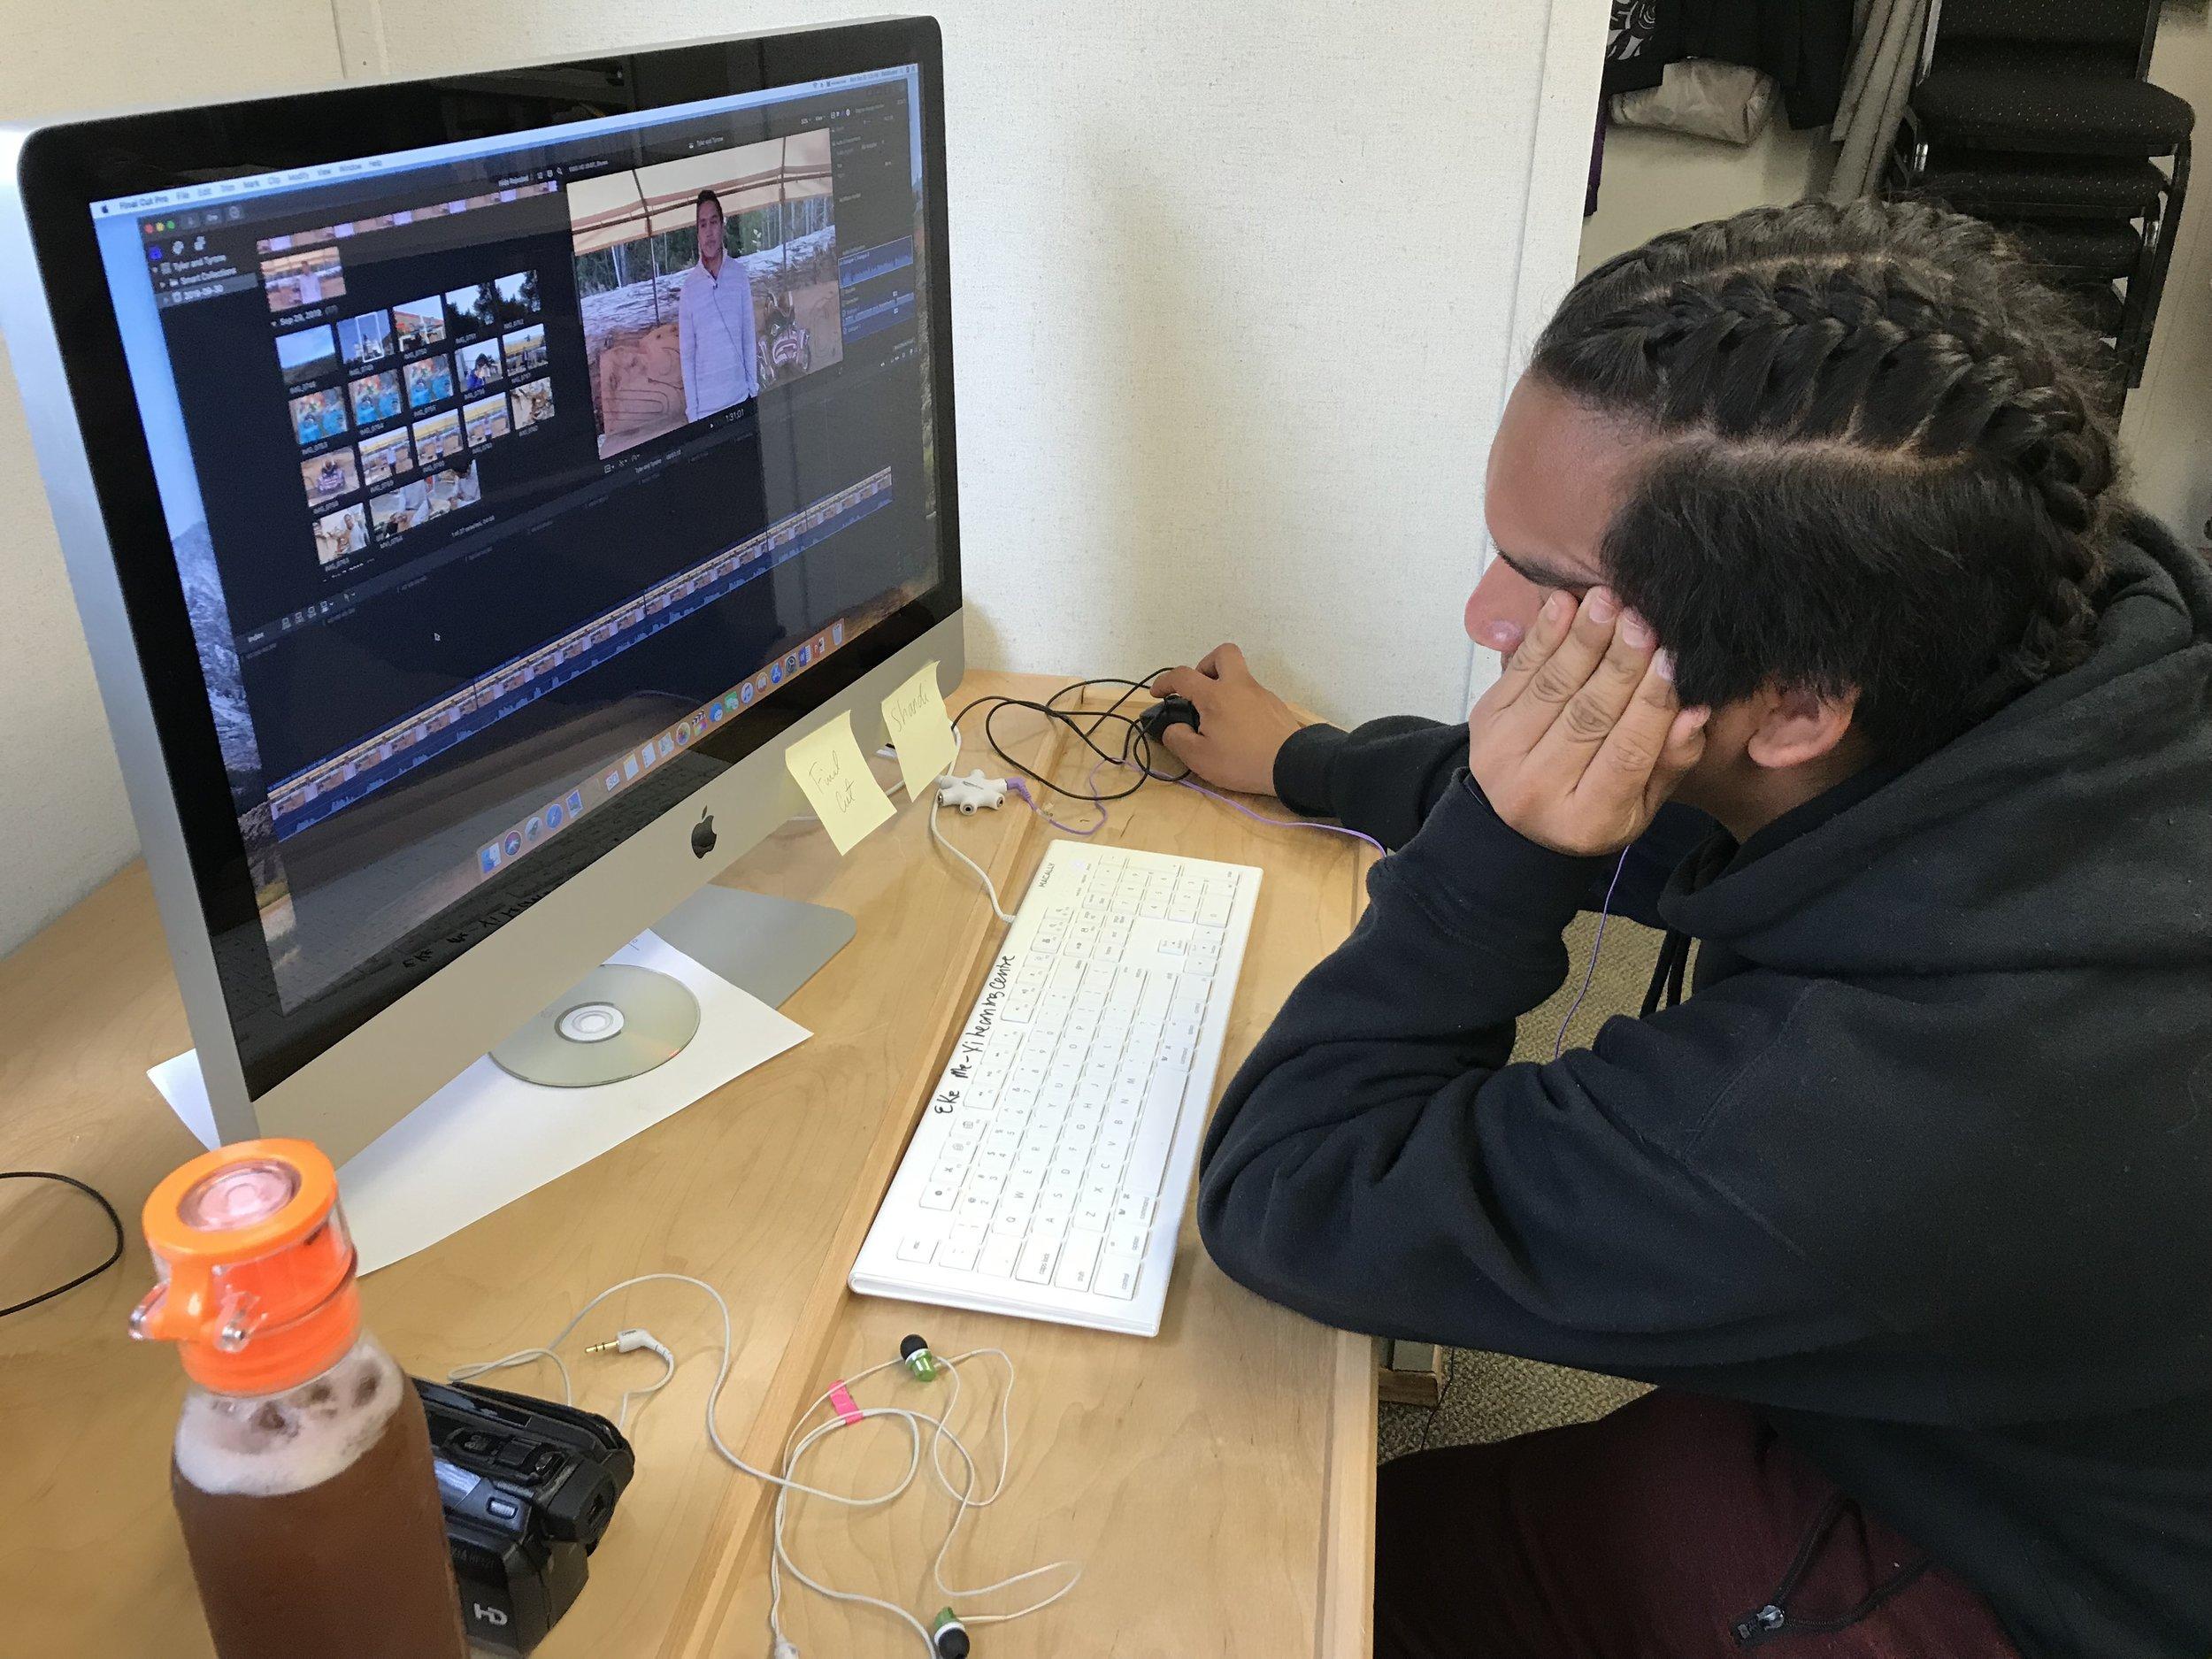 Tyler learns editing qucikly